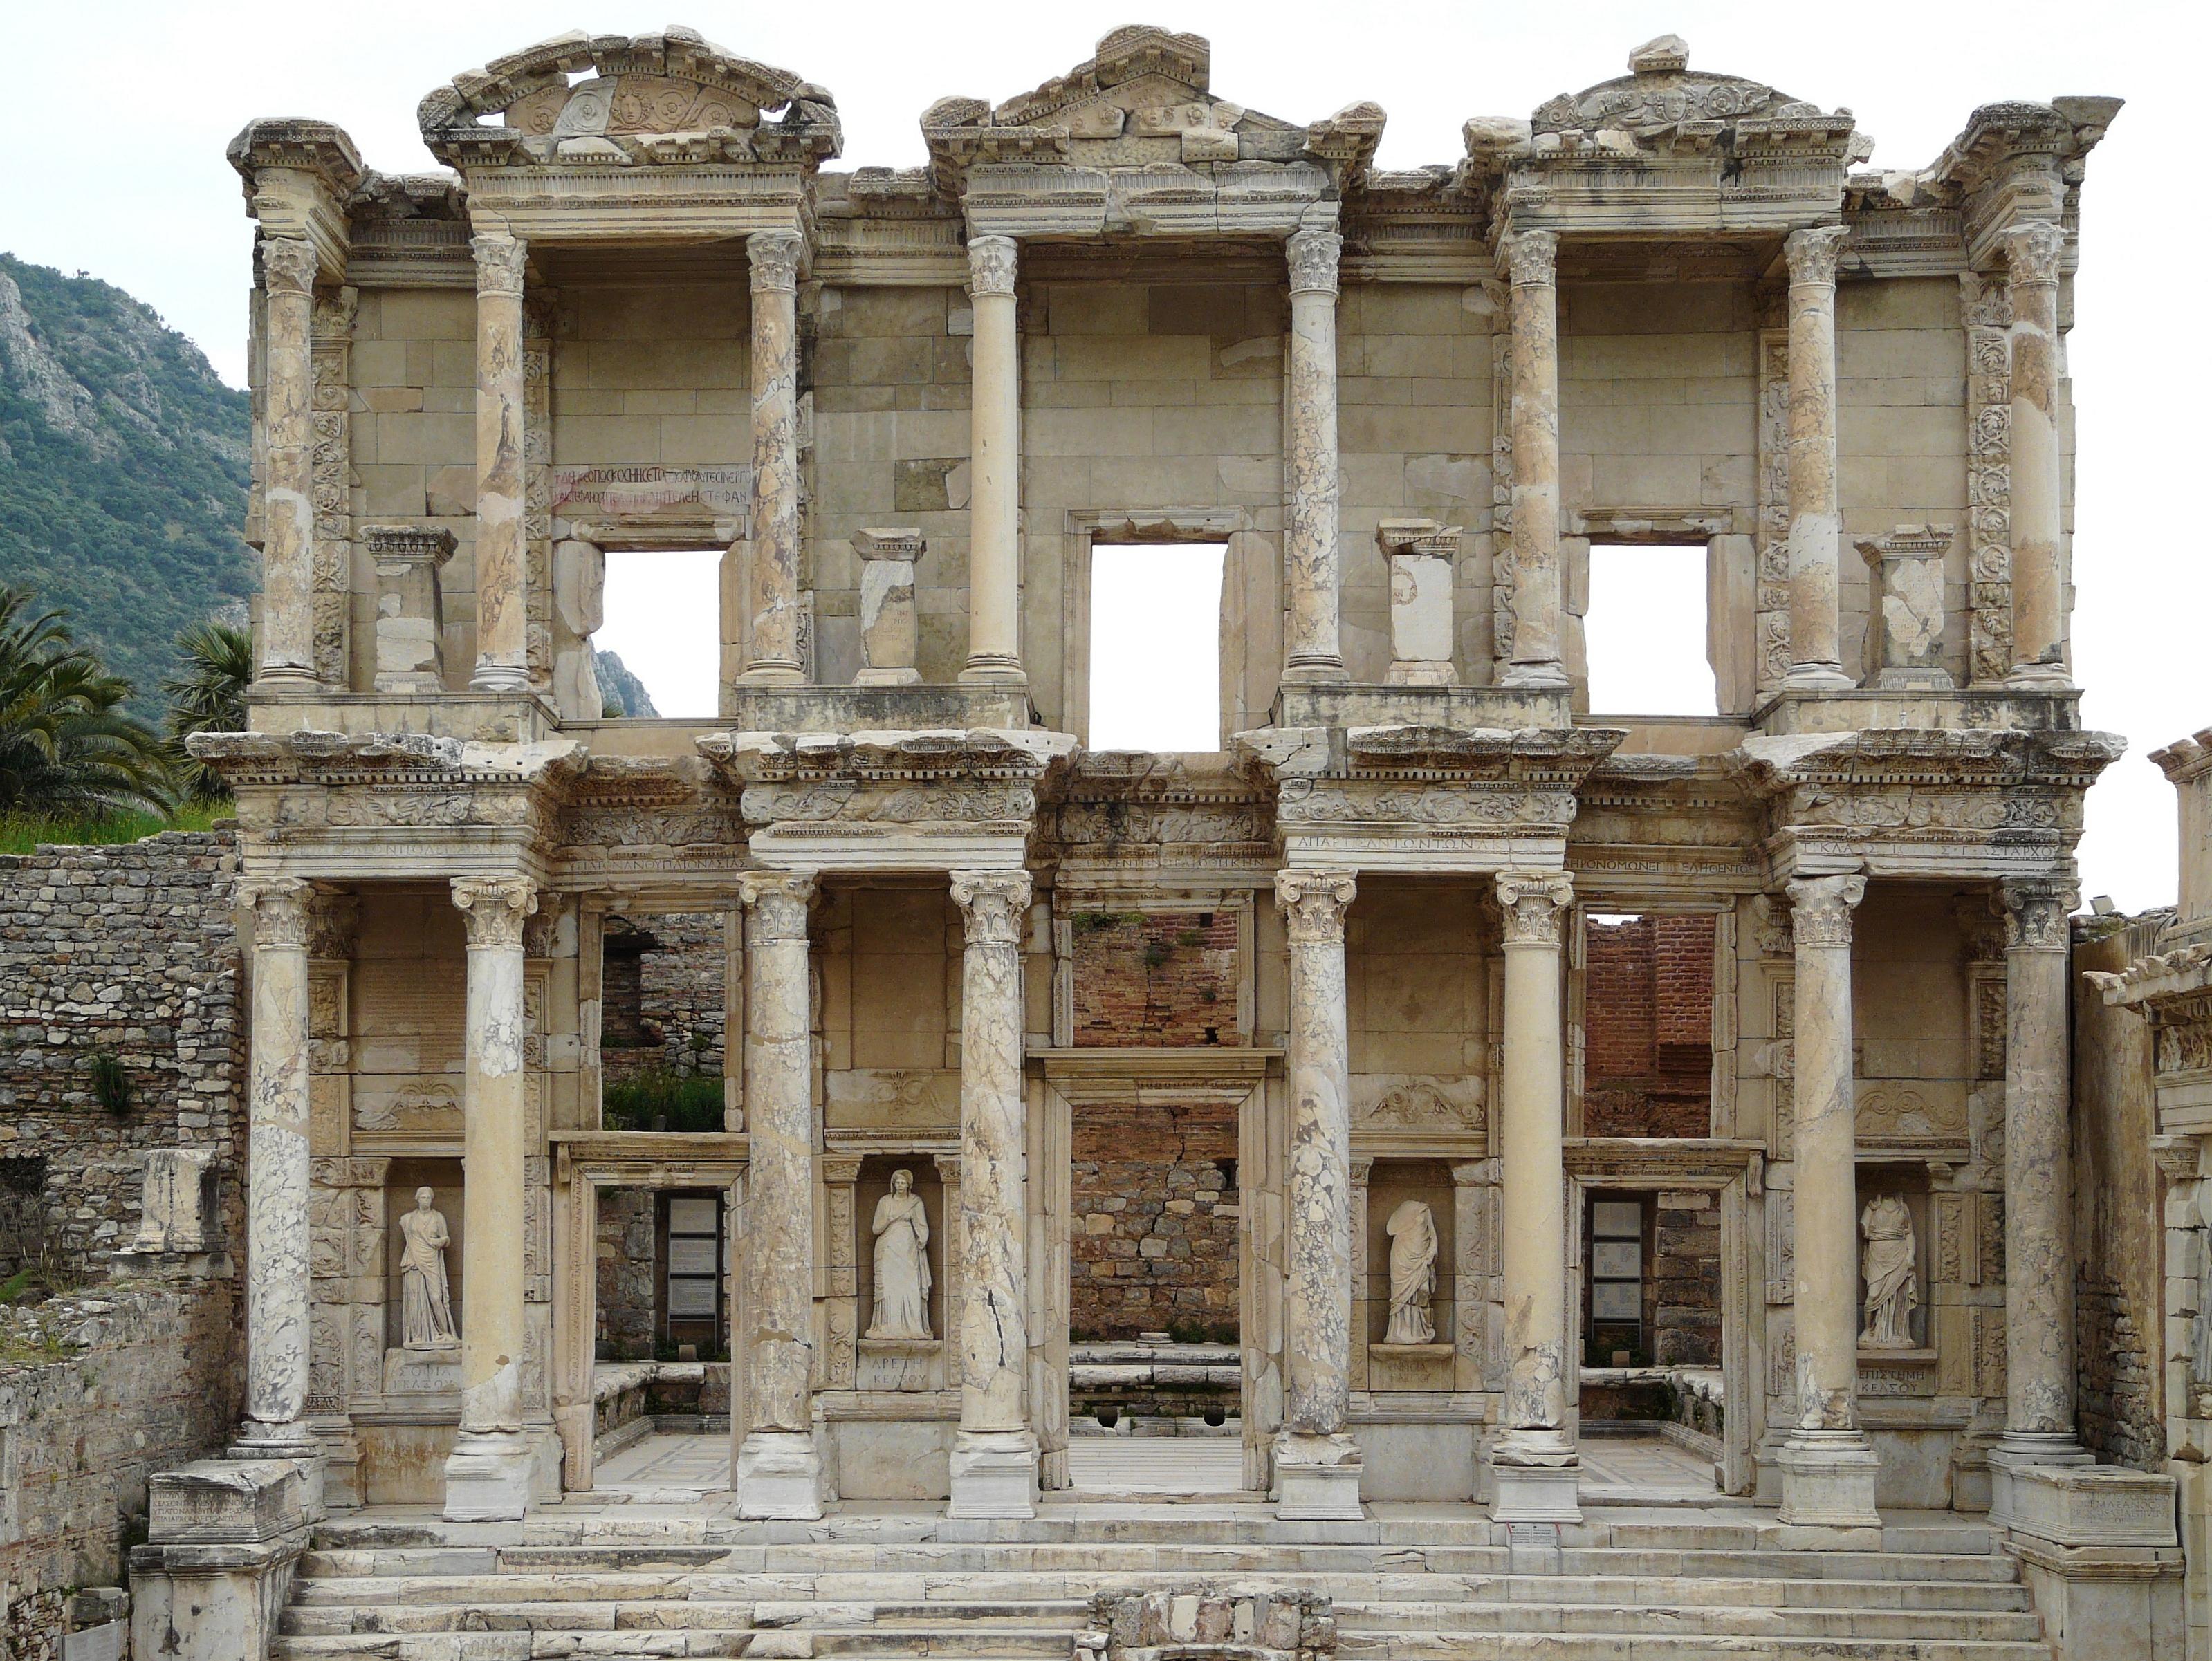 File:Ephesus Celsus library 2009 04 29.jpg - Wikimedia Commons